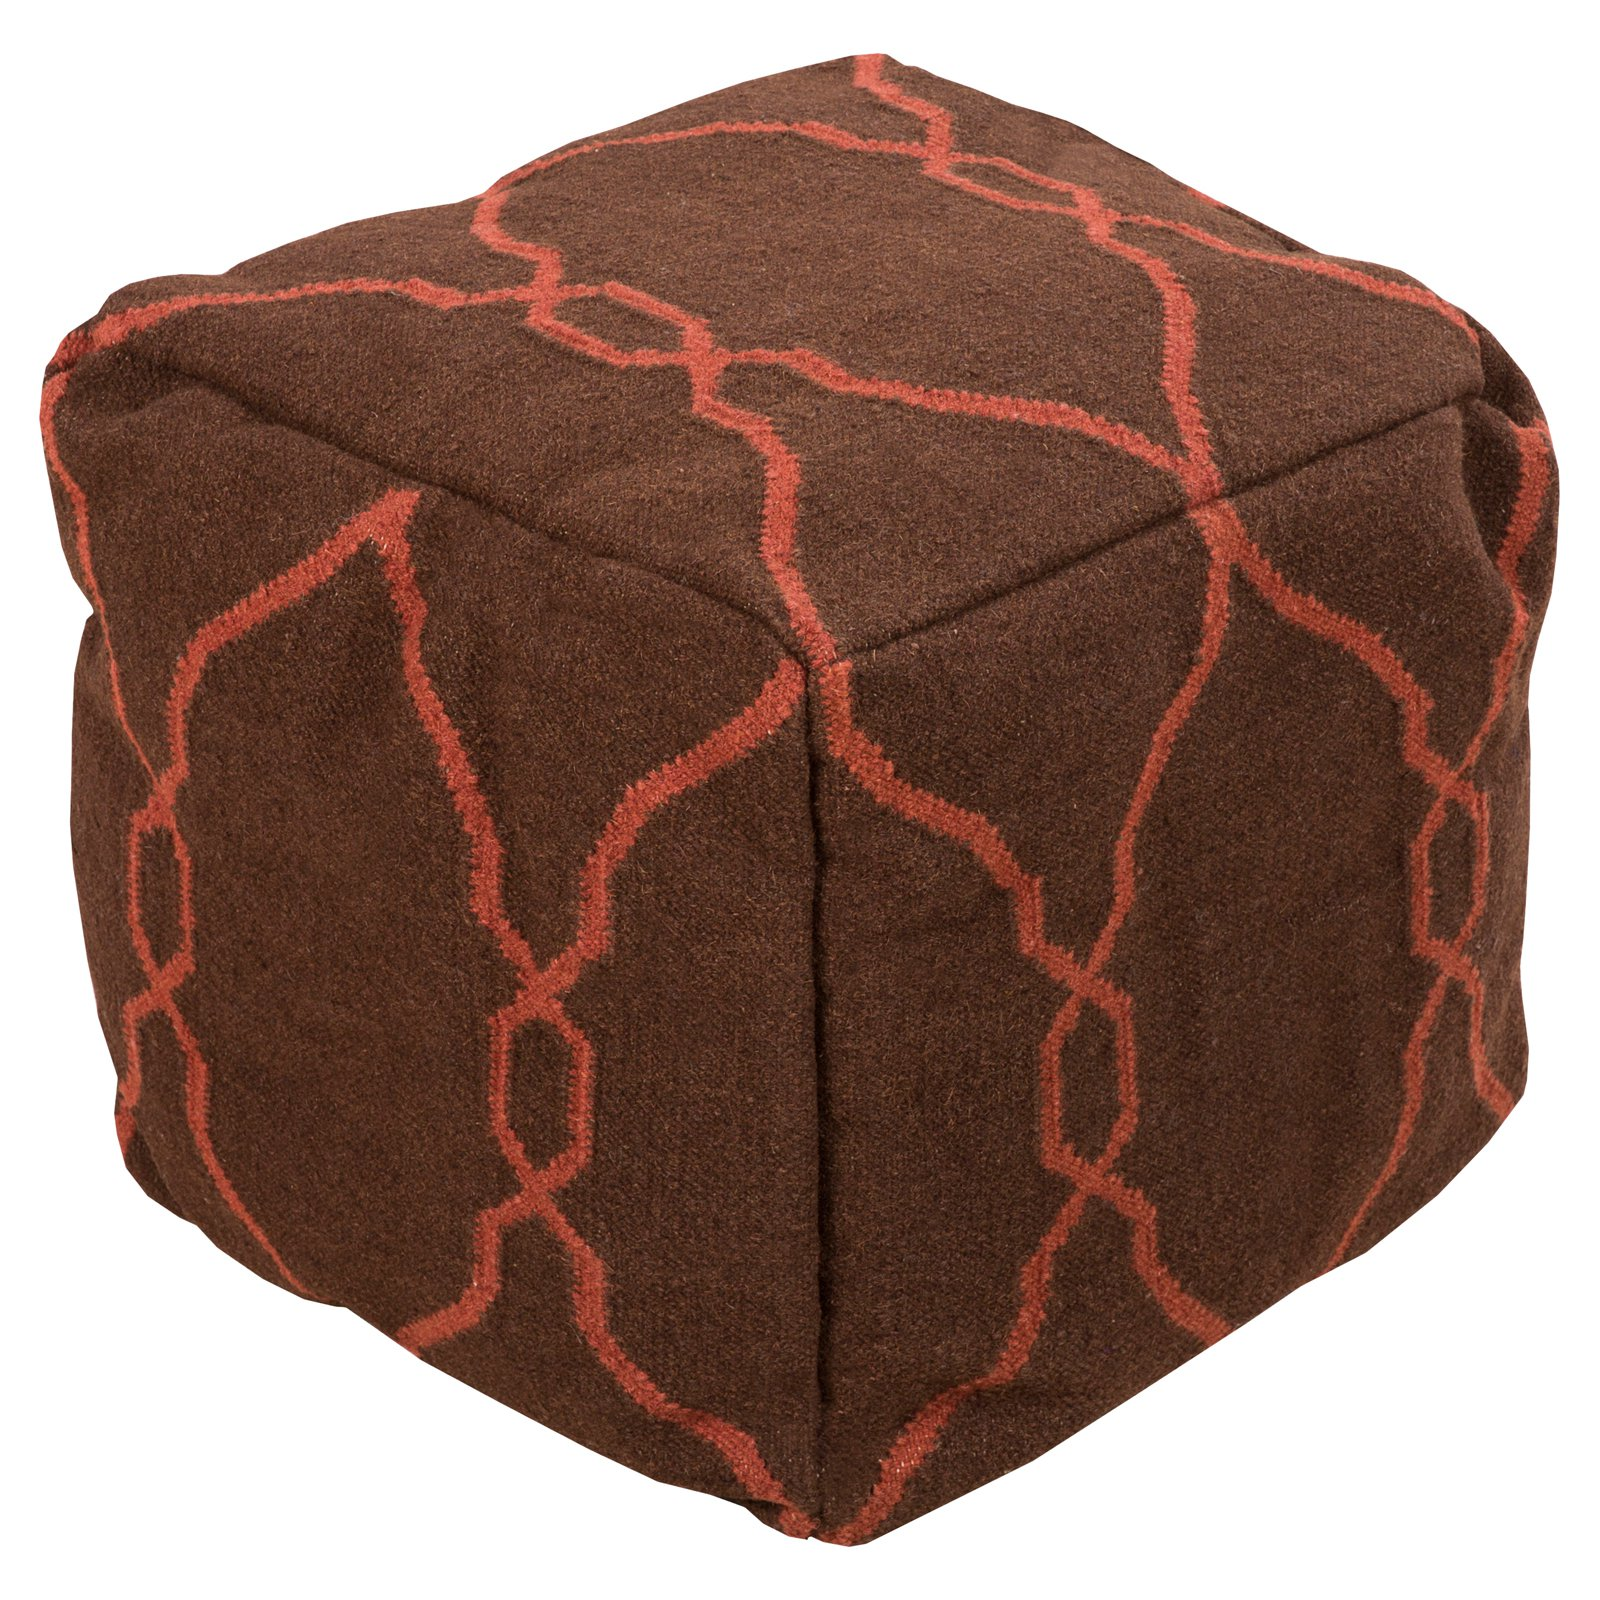 Surya 18 in. Rosenwald Cube Wool Pouf by Surya